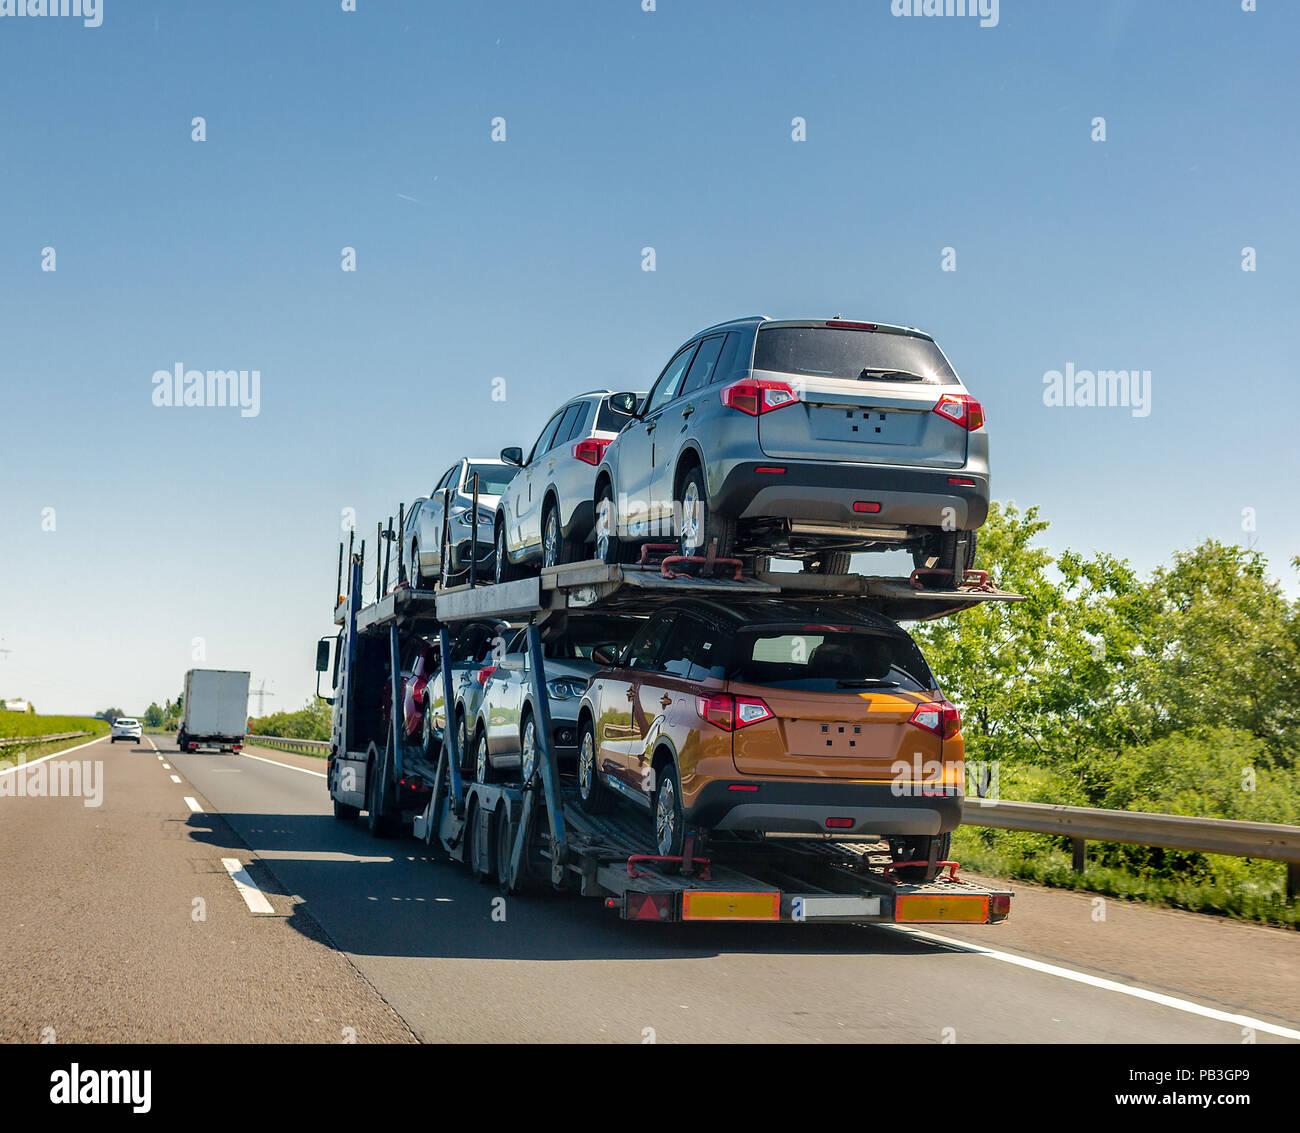 Subaru Dealers In Ct >> Car Carrier Trailer Truck Stock Photos & Car Carrier Trailer Truck Stock Images - Alamy